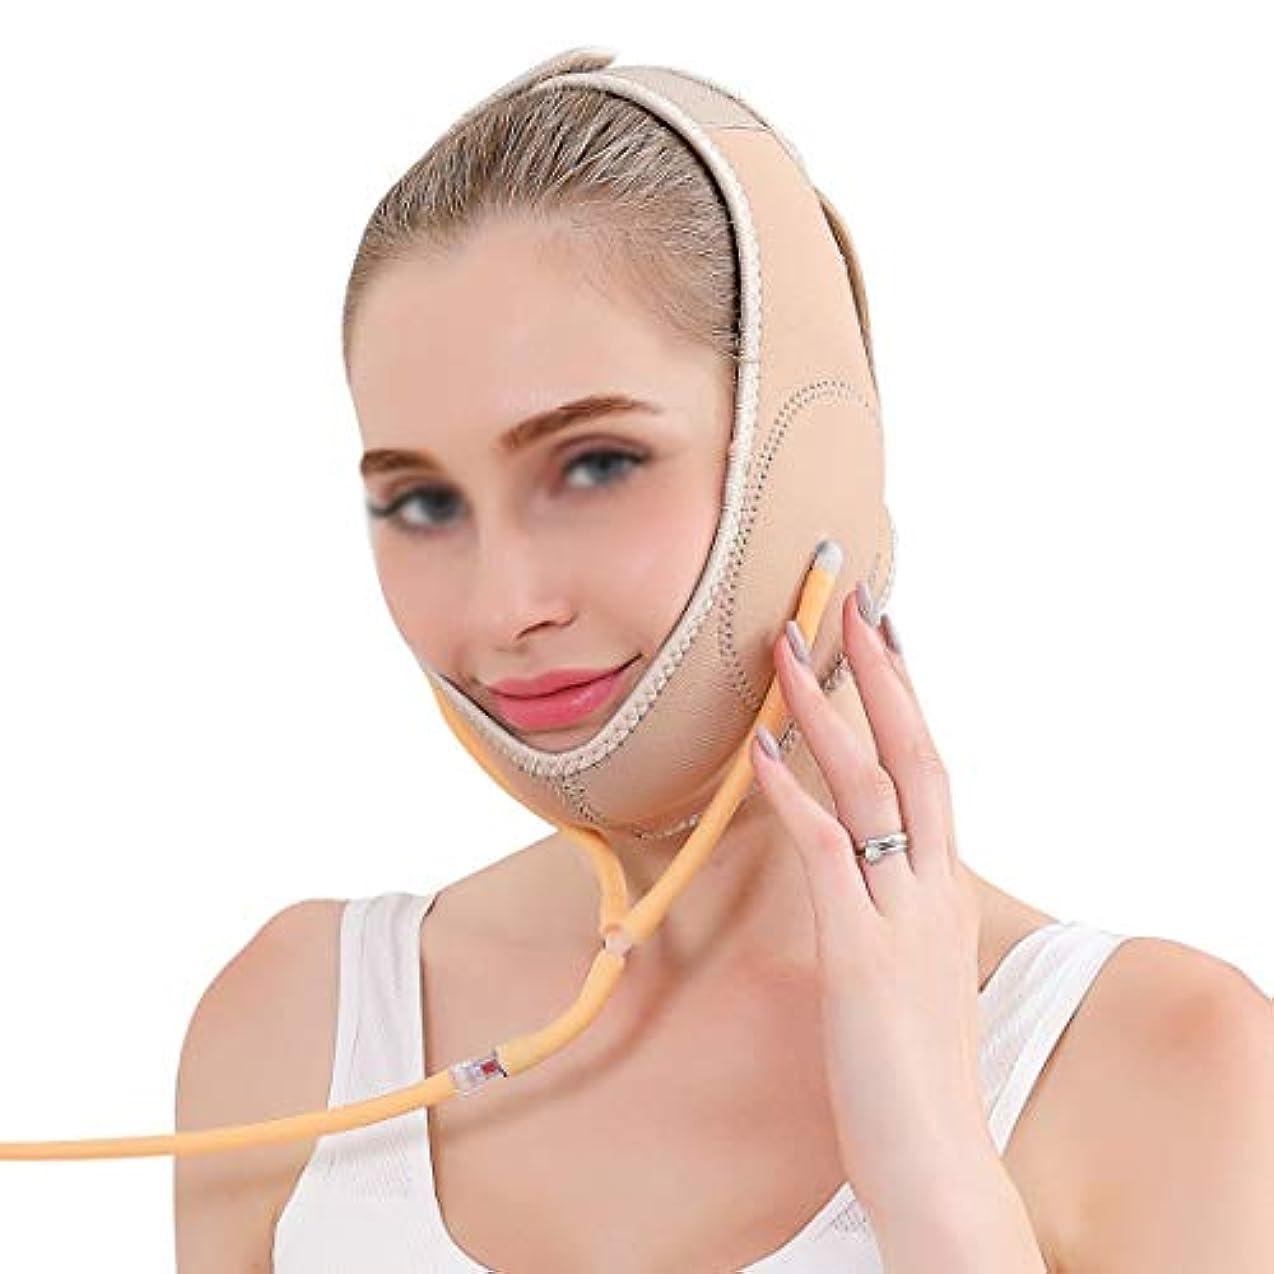 ZWBD フェイスマスク, フェイスリフティング包帯フェイスリフティングマスク小Vフェイスリフティング整形咬合筋肉引き締めパターン薄いフェイスステッカーアーティファクトダブルチン包帯インフレータブル (Color : Beige)